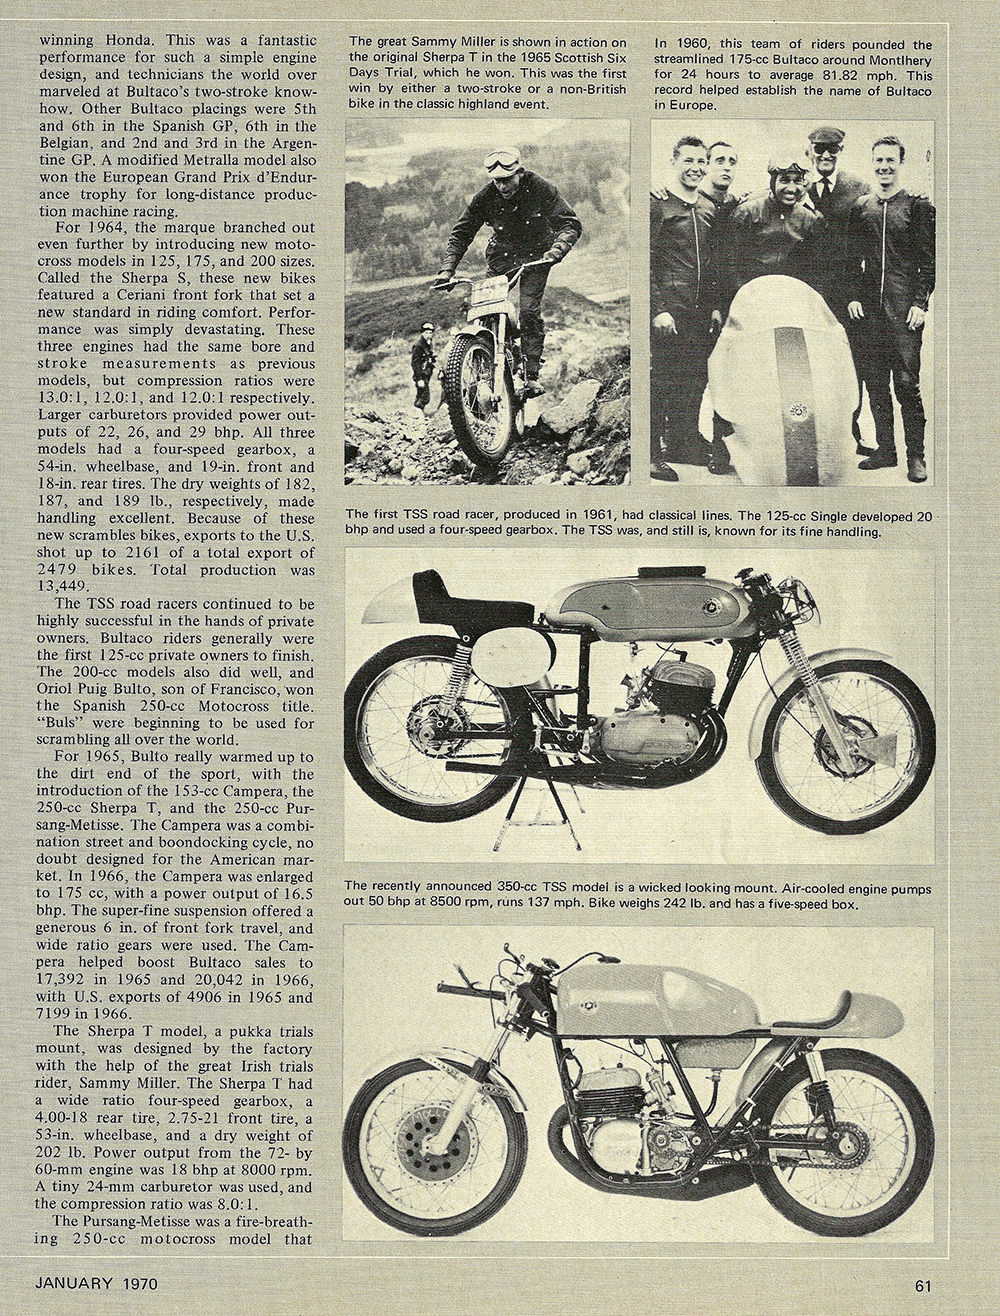 History of Bultaco 04.jpg